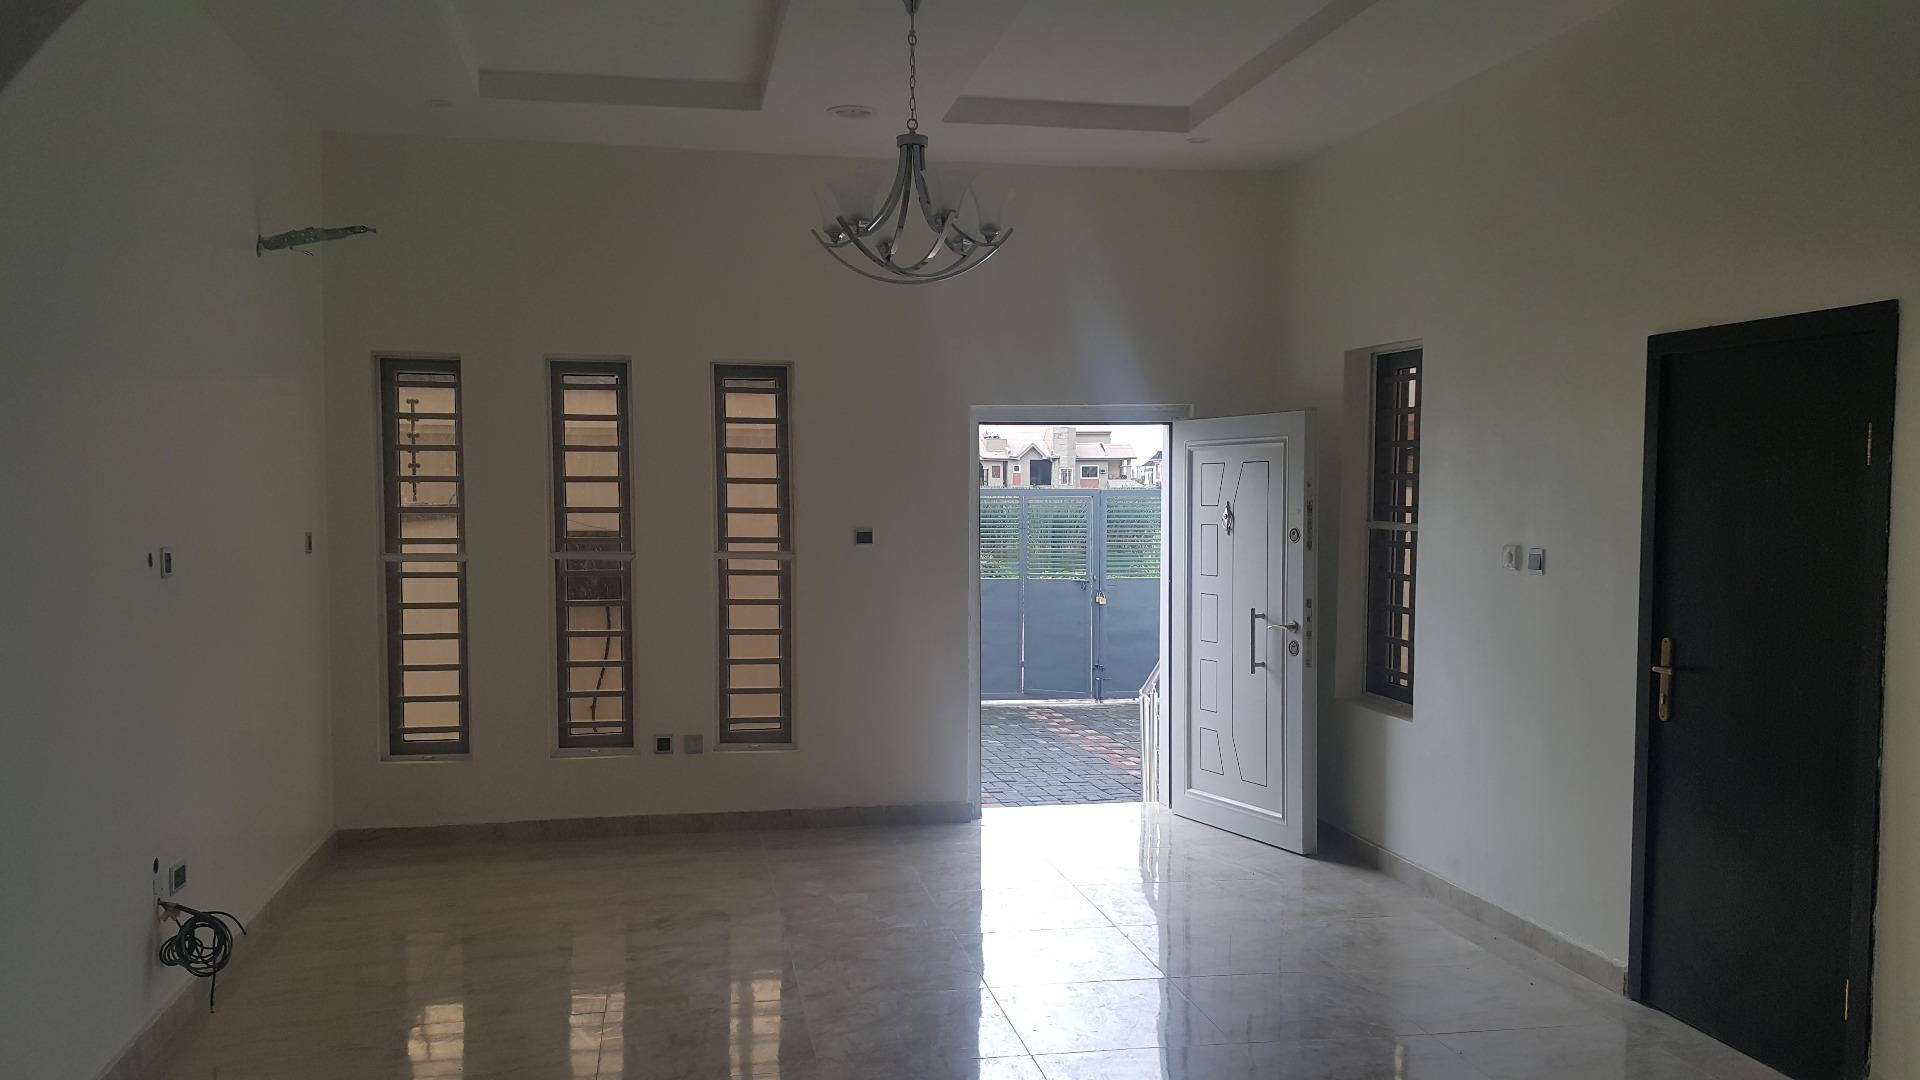 Estate for sale New 4 bedroom House for sale in Lekki — PropertyCheck NG